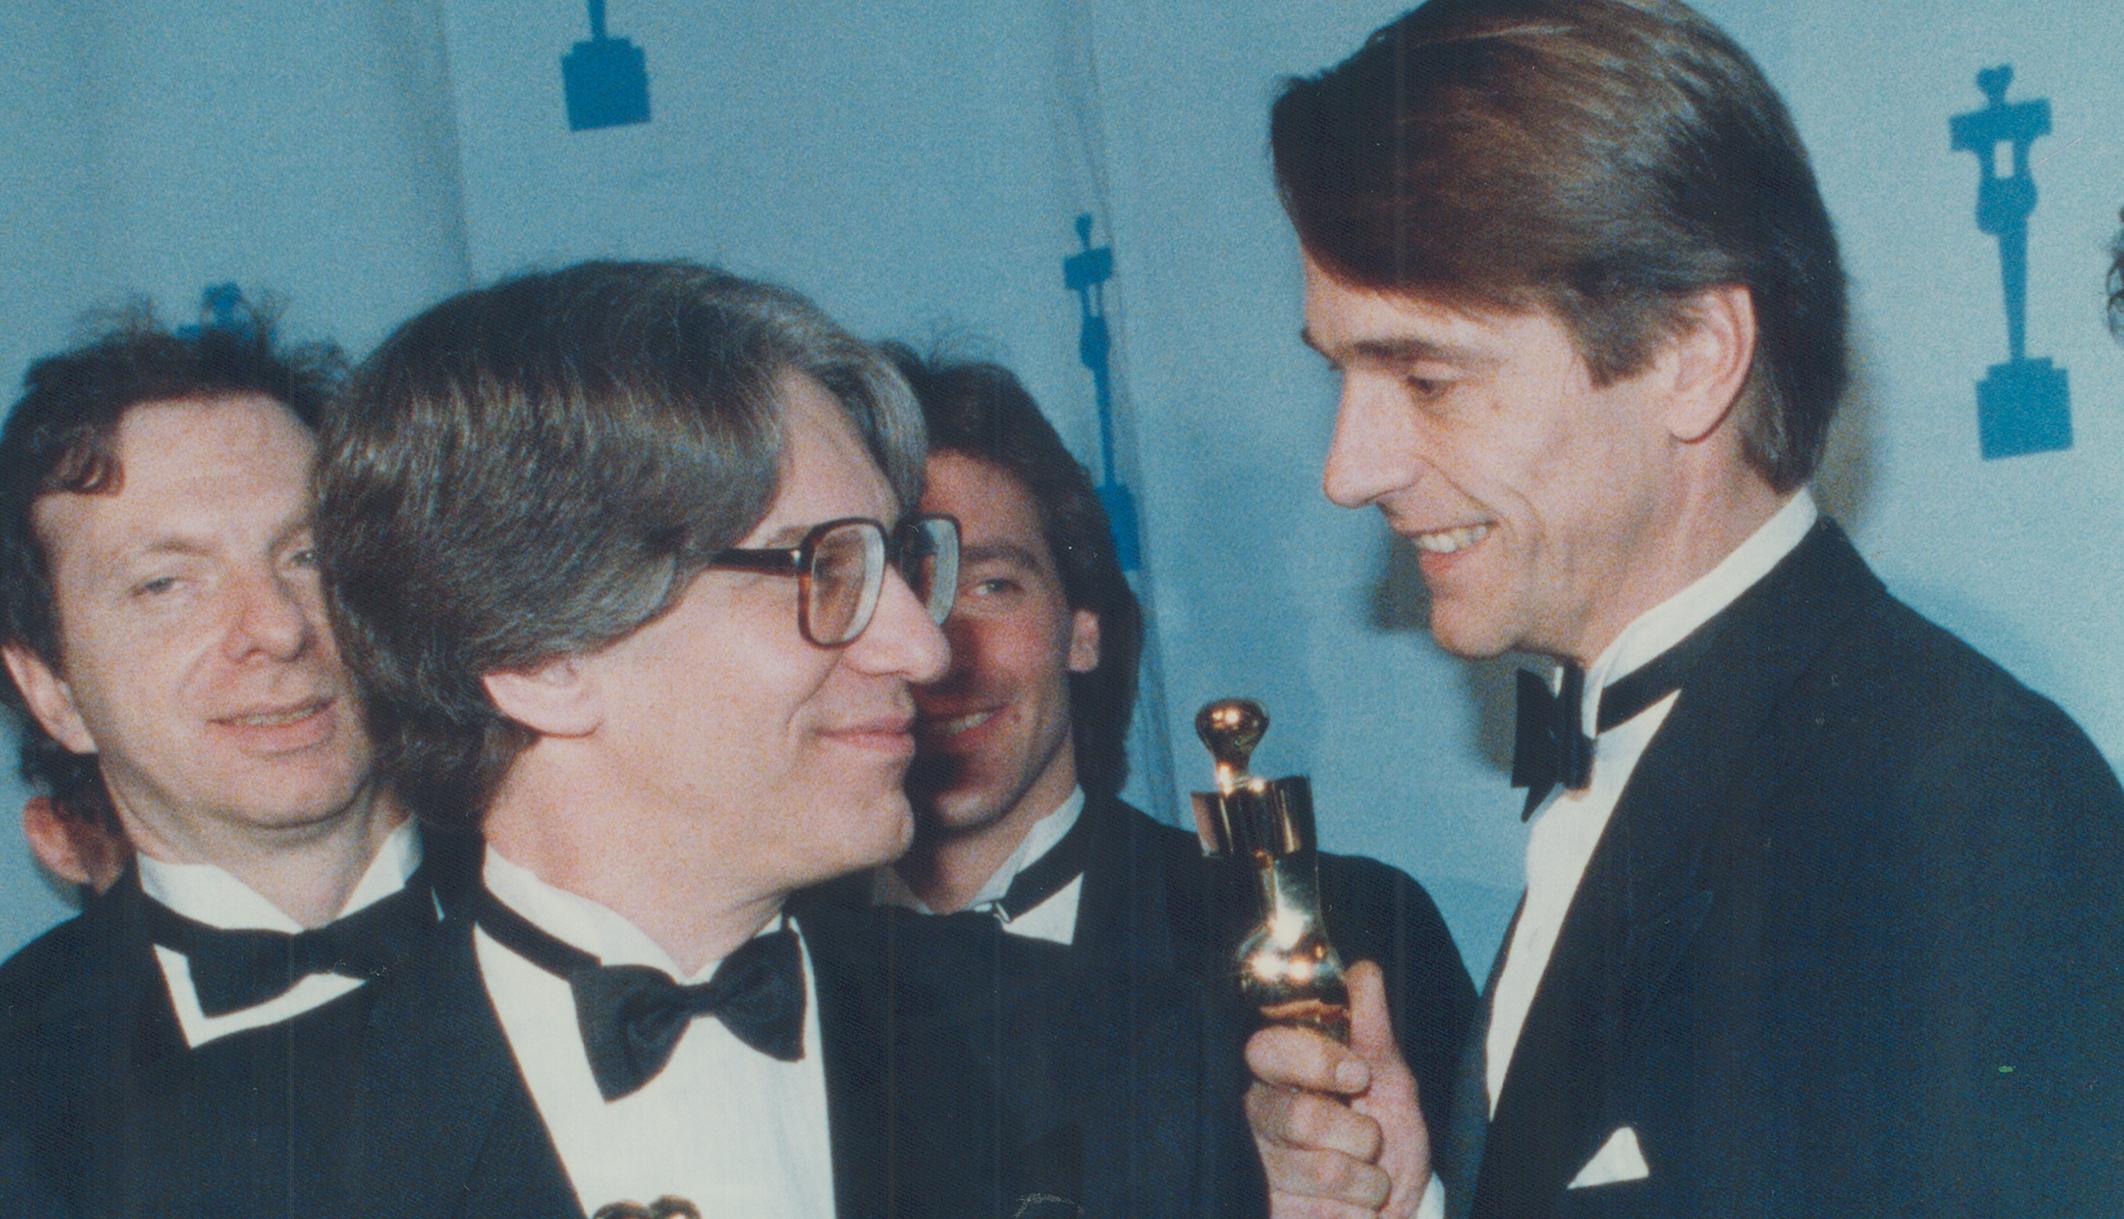 The True Crime Story Bag David Cronenbergs Horror Masterpiece 'Dead Ringers'